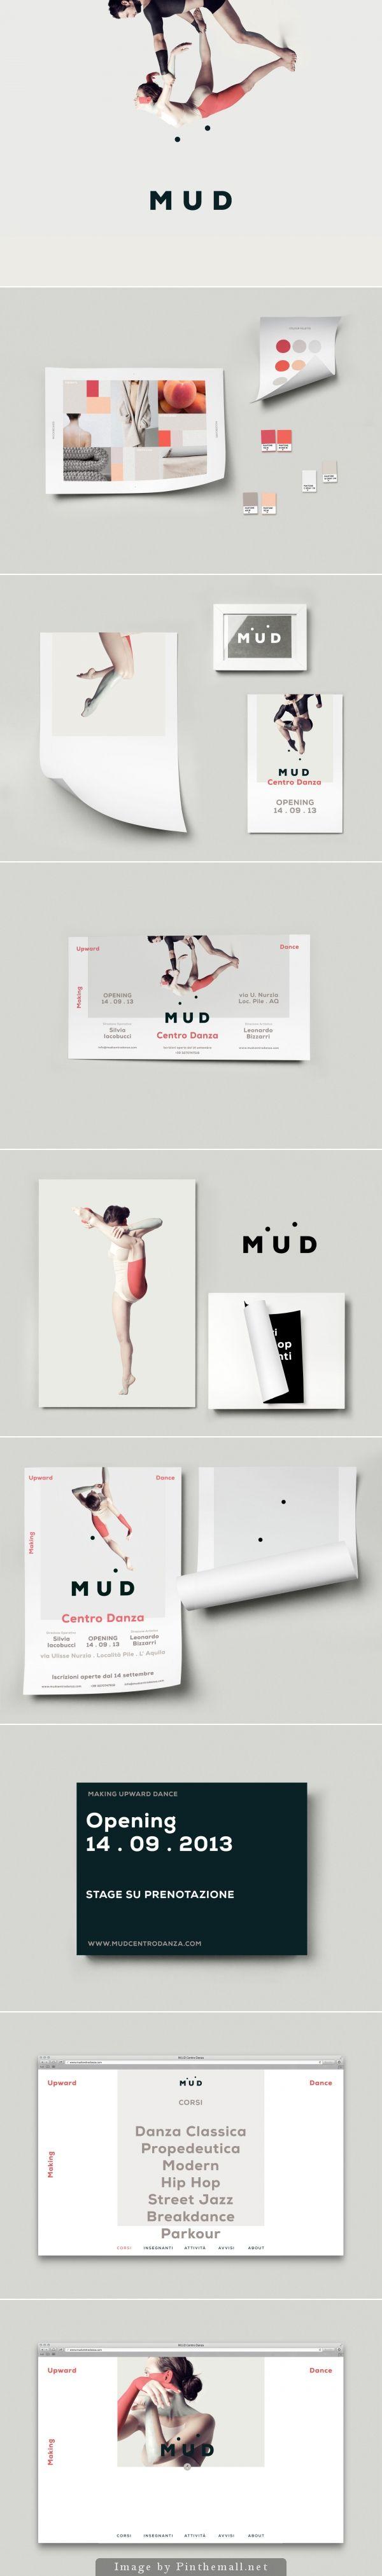 M.U.D Branding